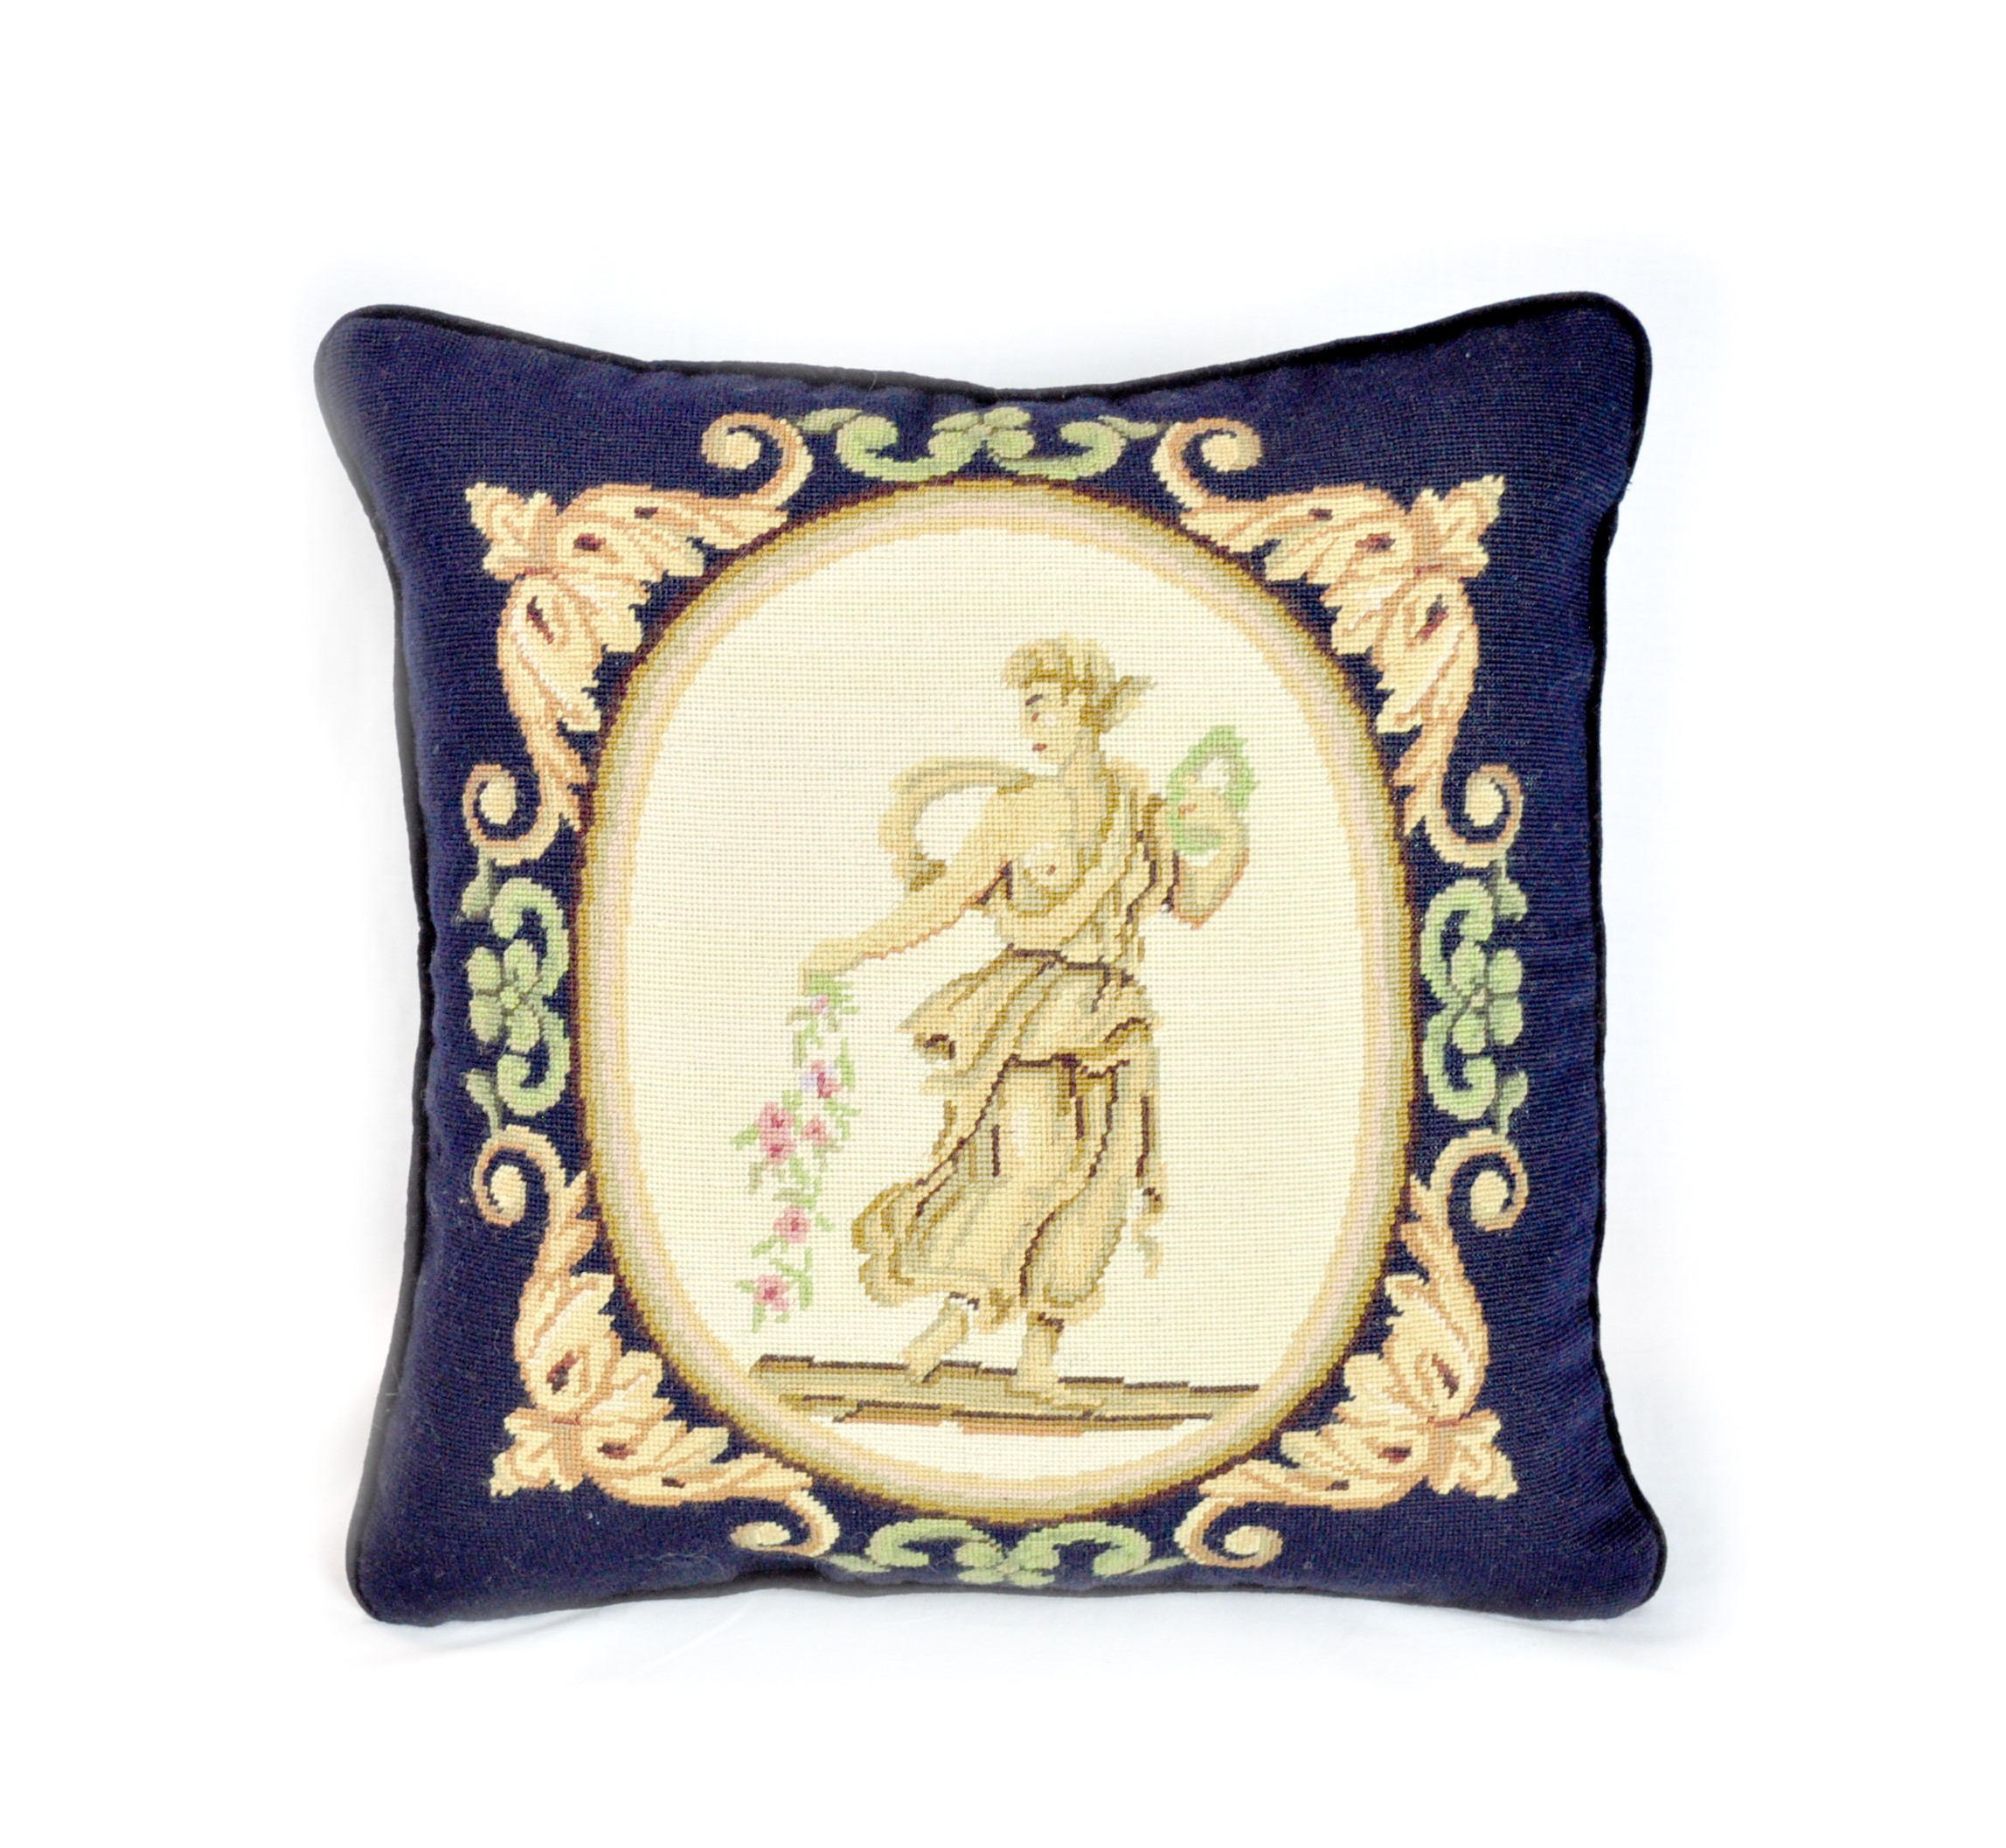 16″x16″ Wool Needlepoint Greek Goddess Navy Blue Cushion Cover Pillow Case 12981044